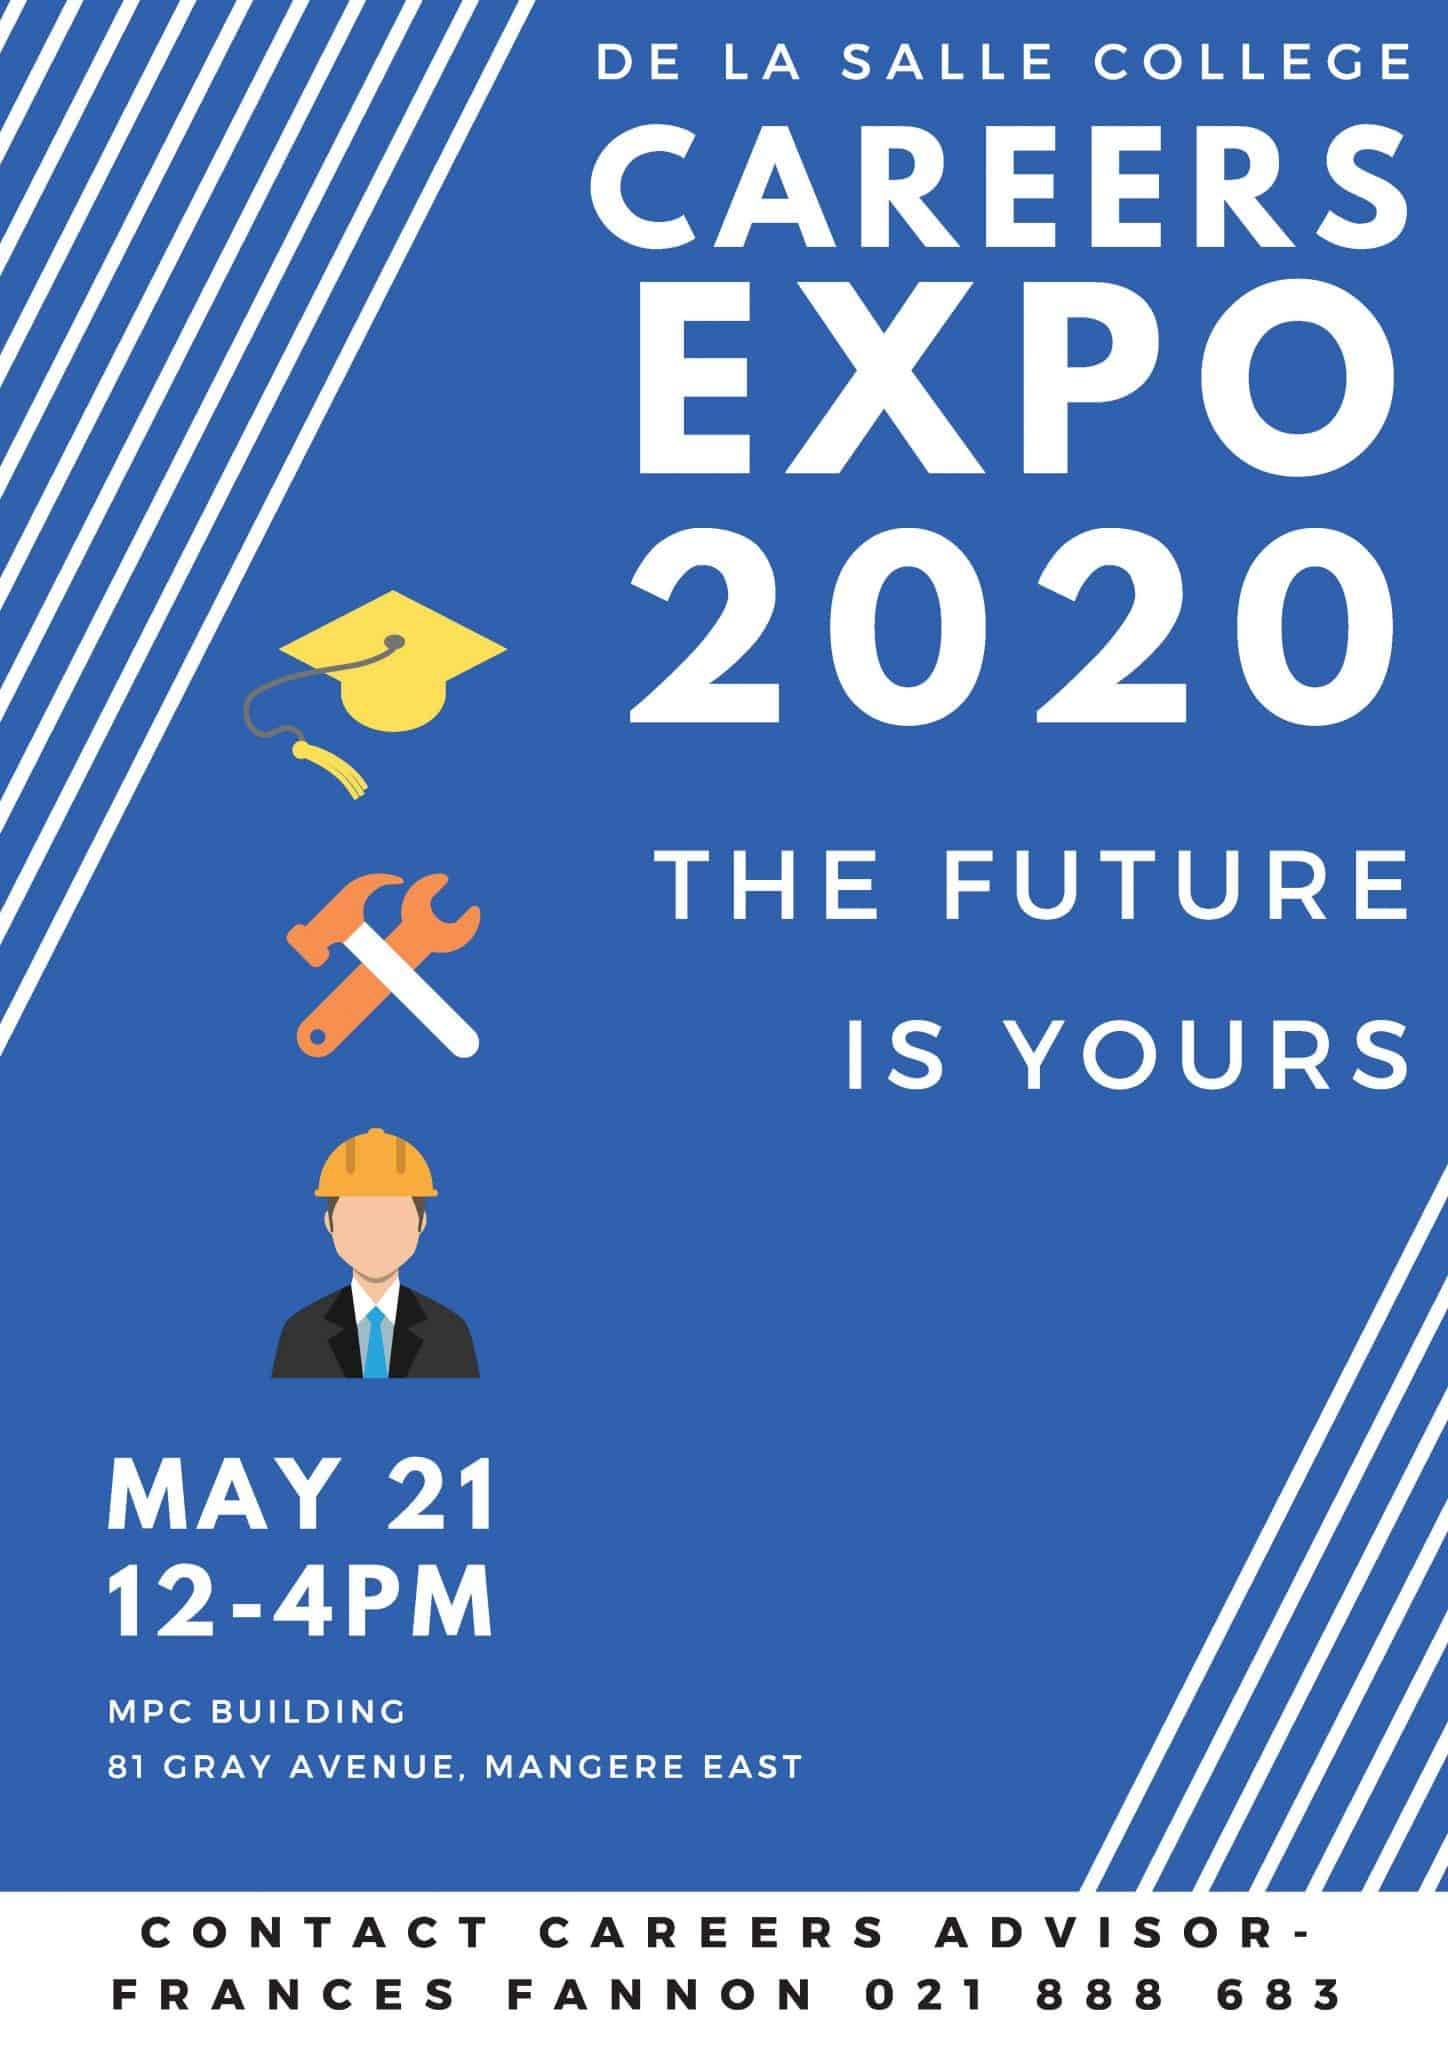 2020 Careers Expo